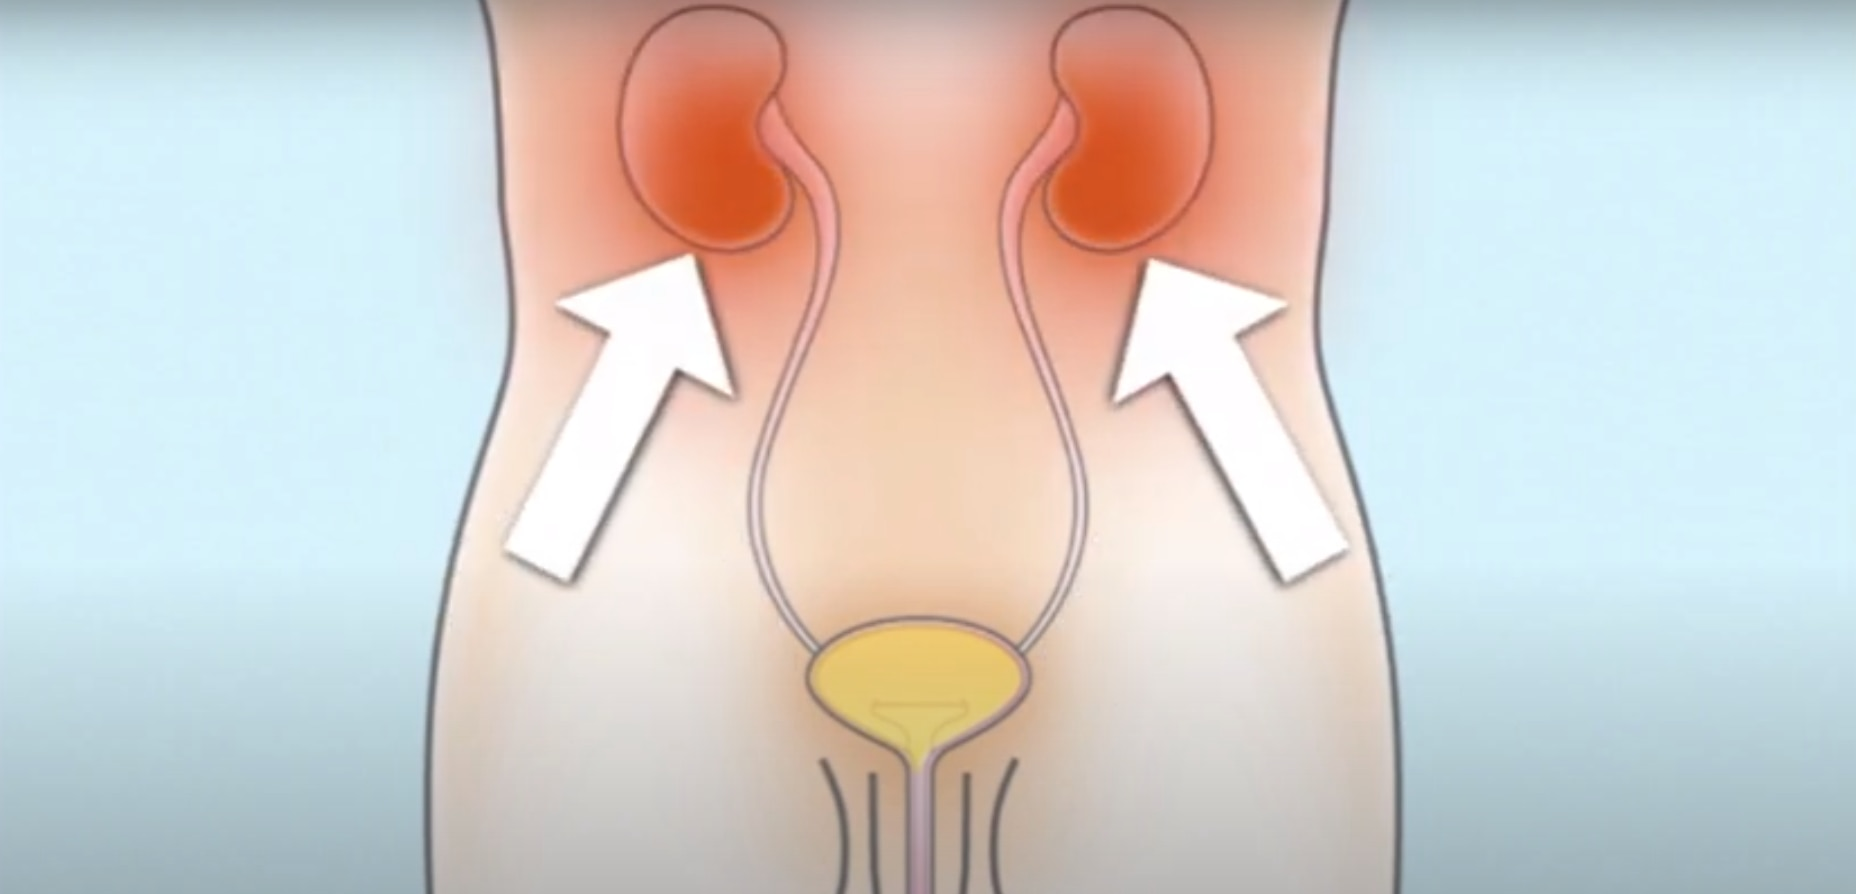 How the bladder works for boys